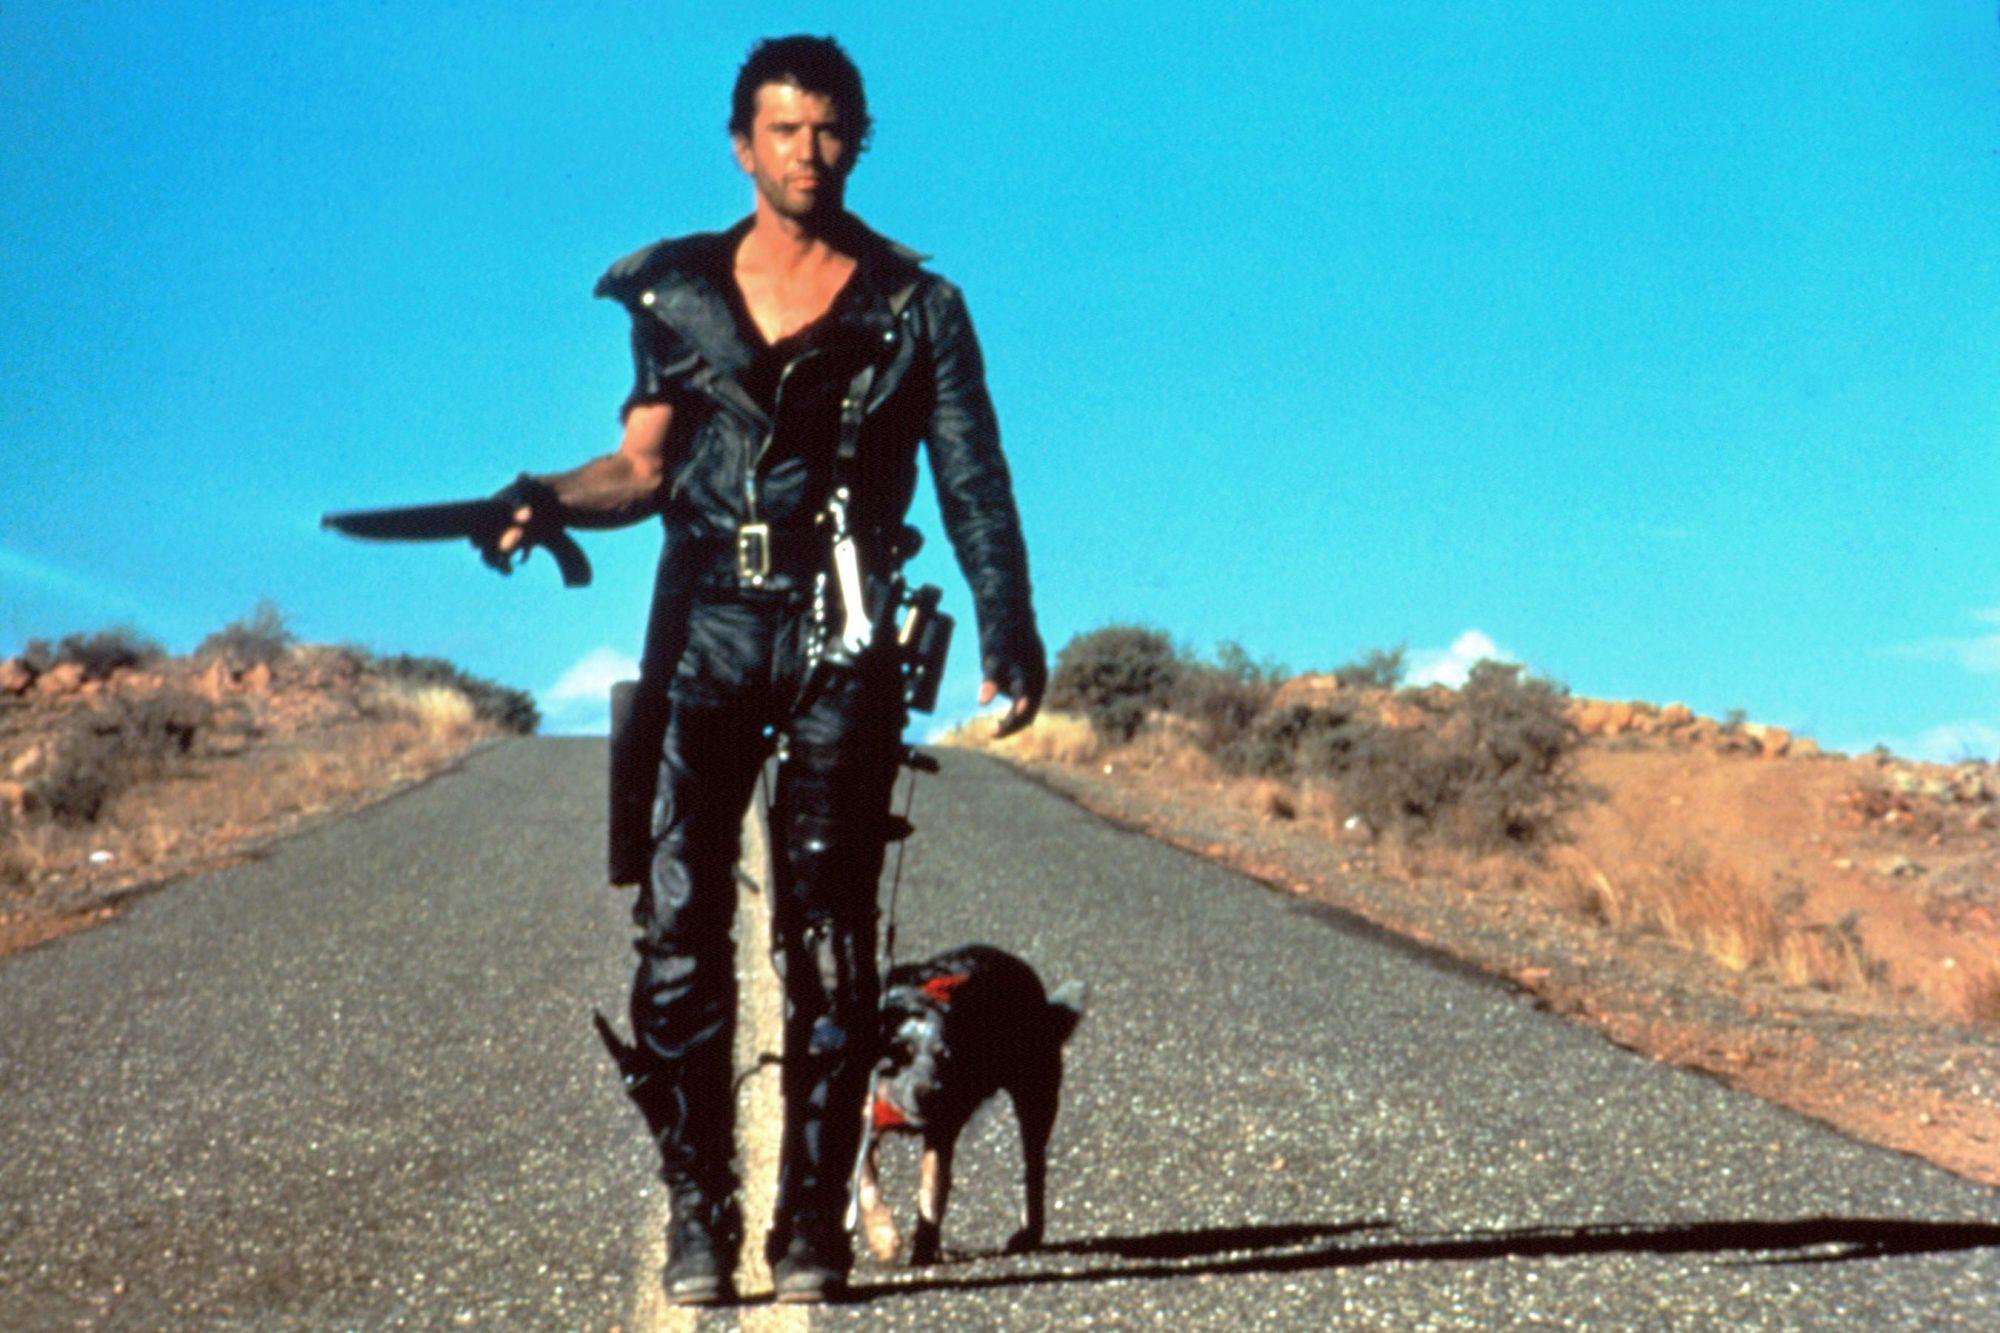 THE ROAD WARRIOR, (aka MAD MAX 2: THE ROAD WARRIOR), Mel Gibson, 1981